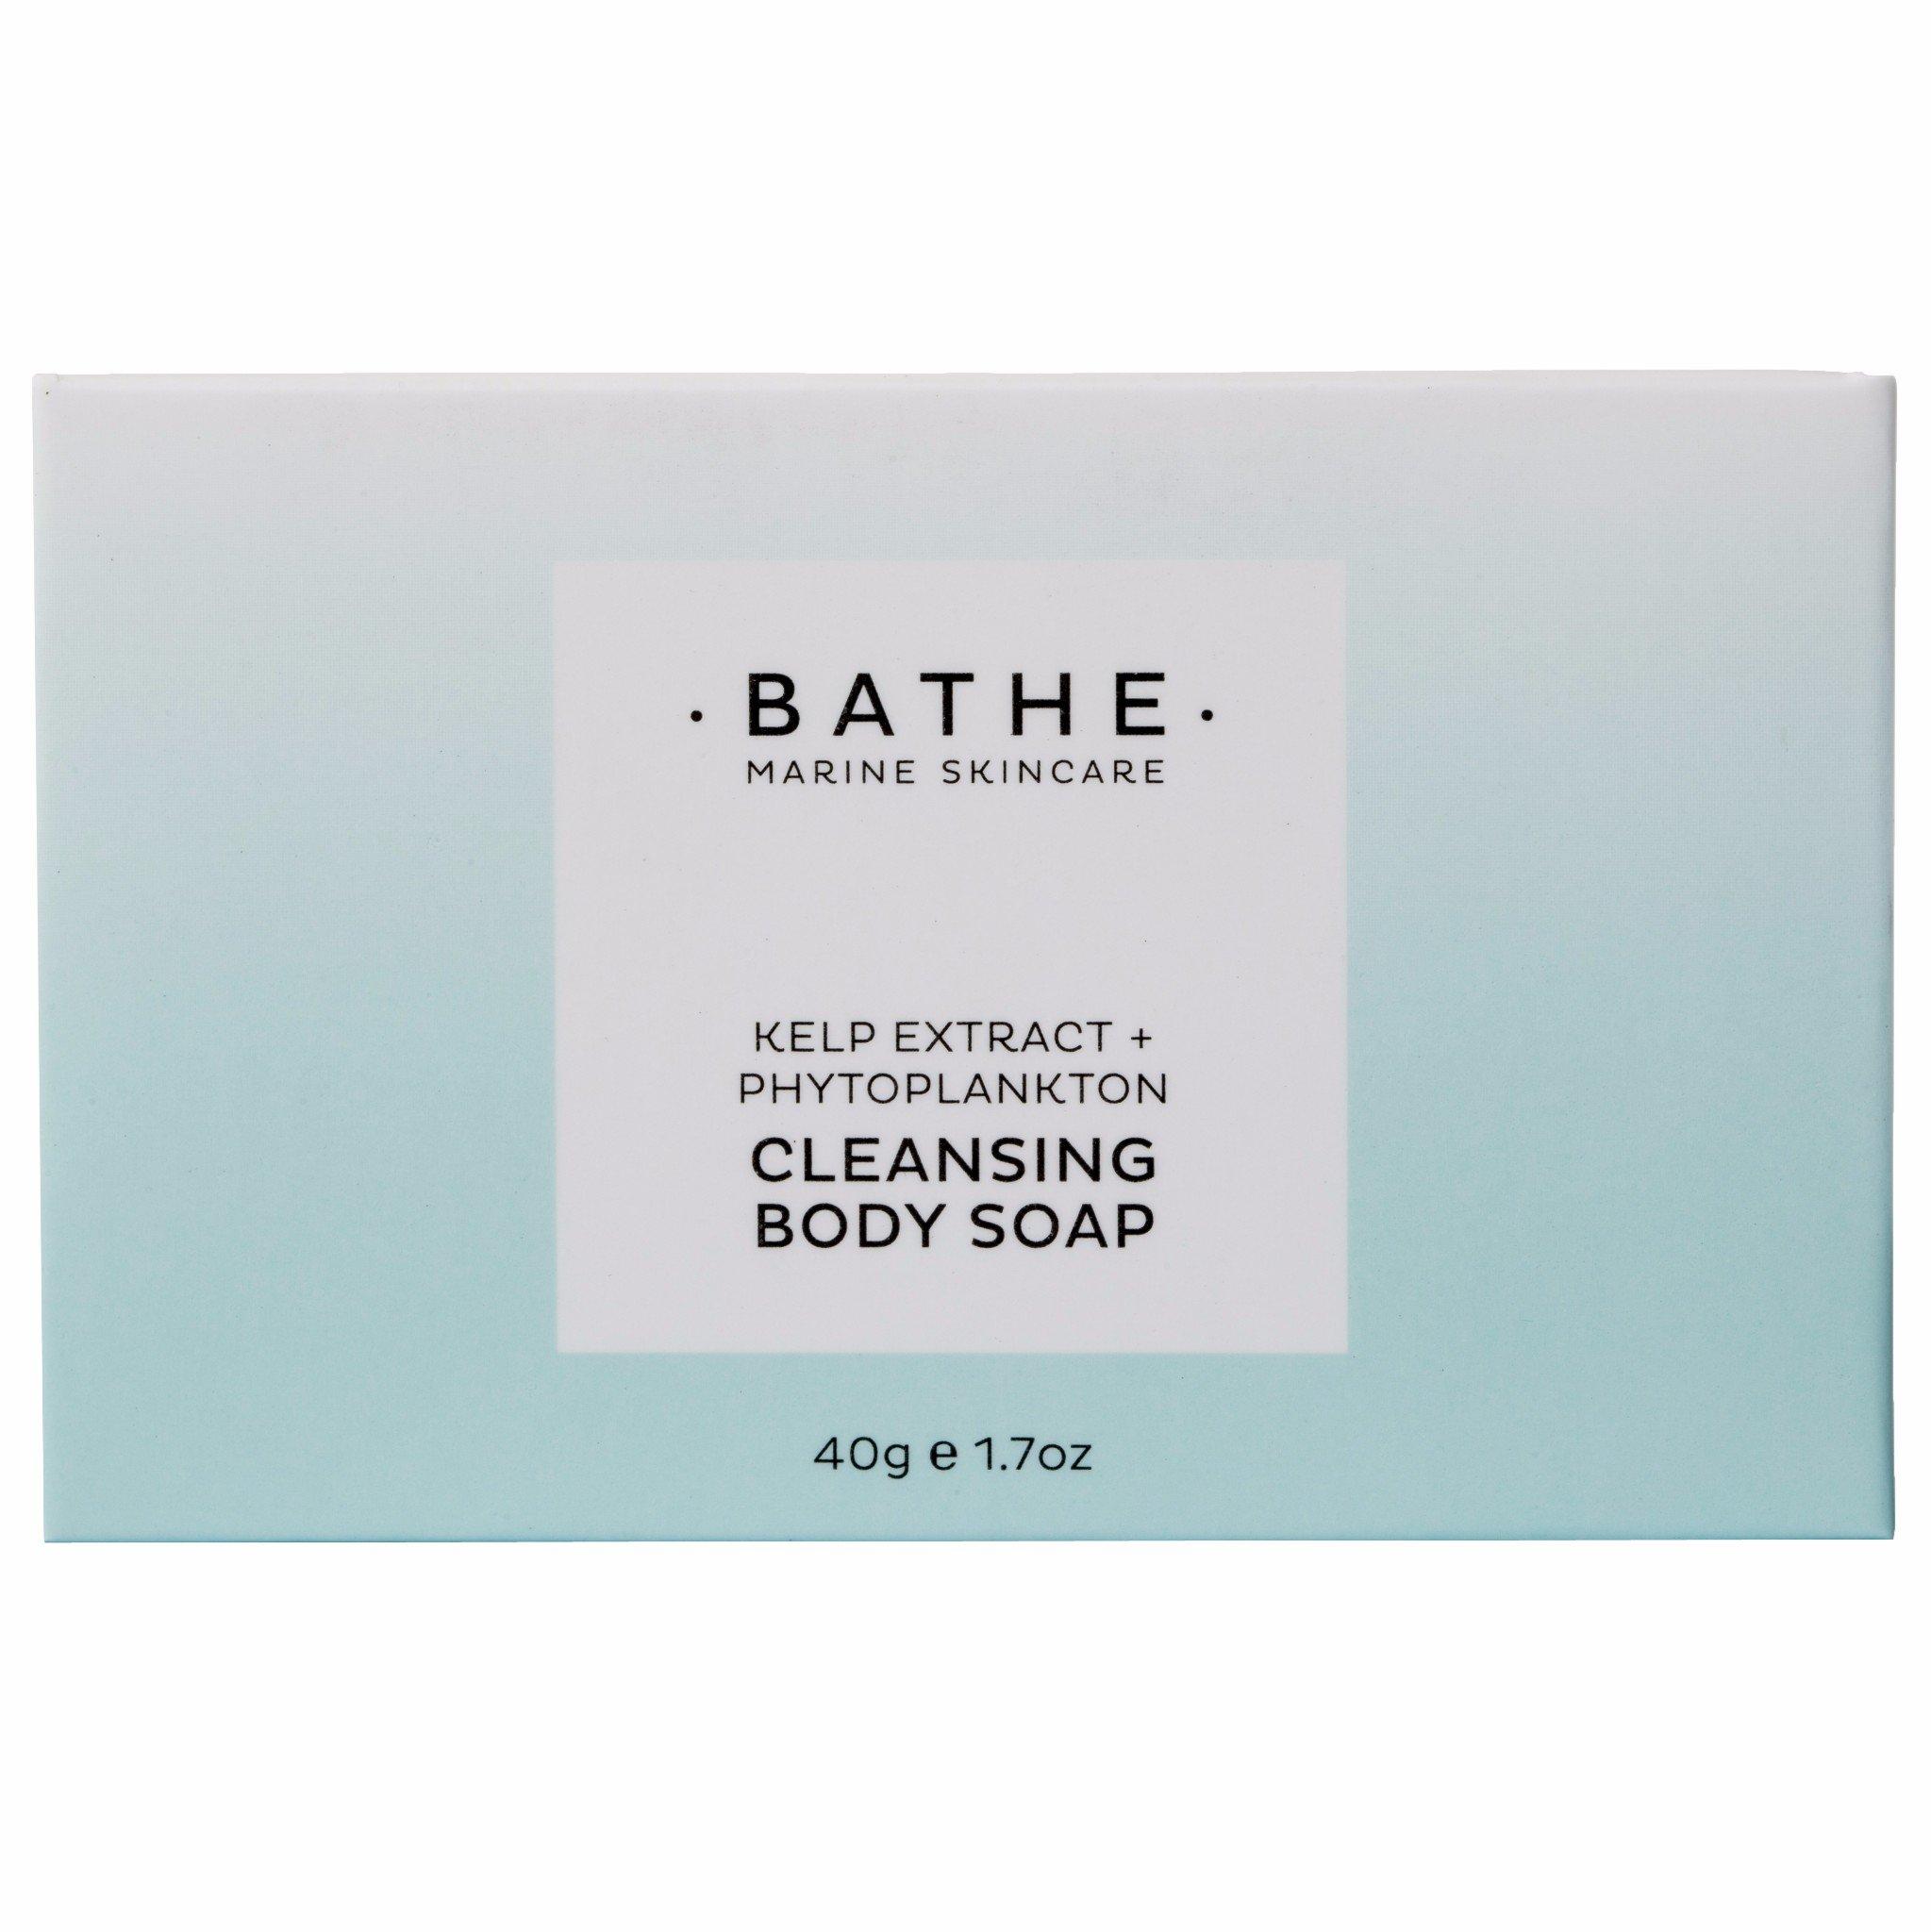 Bathe Marine 40g Boxed Body Soap